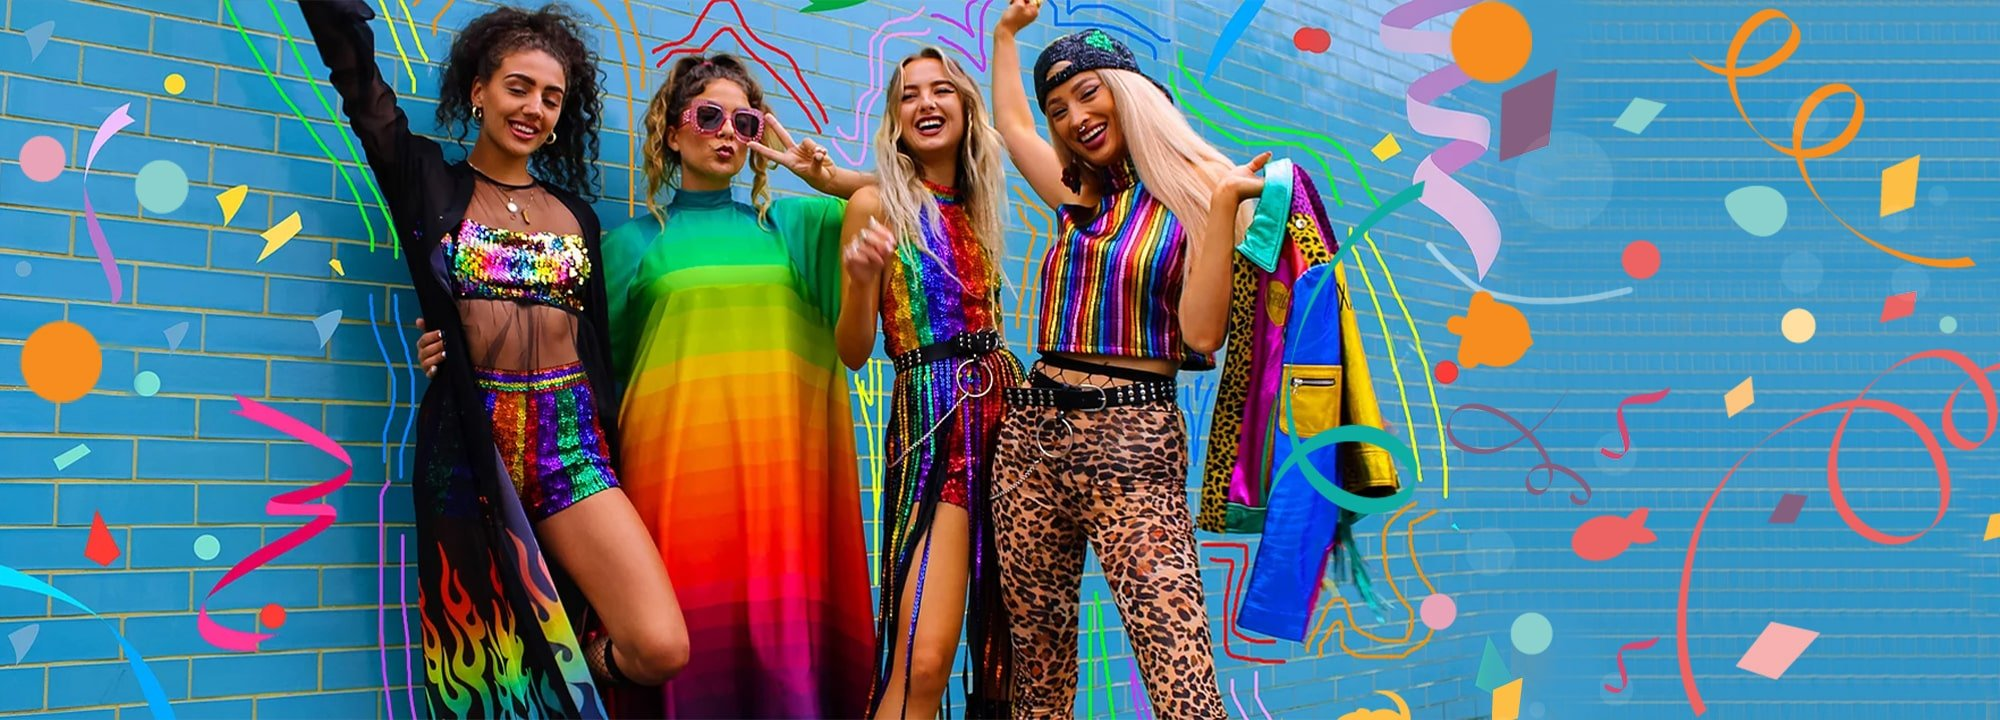 Shop Confetti Crowd X LGBT Collection